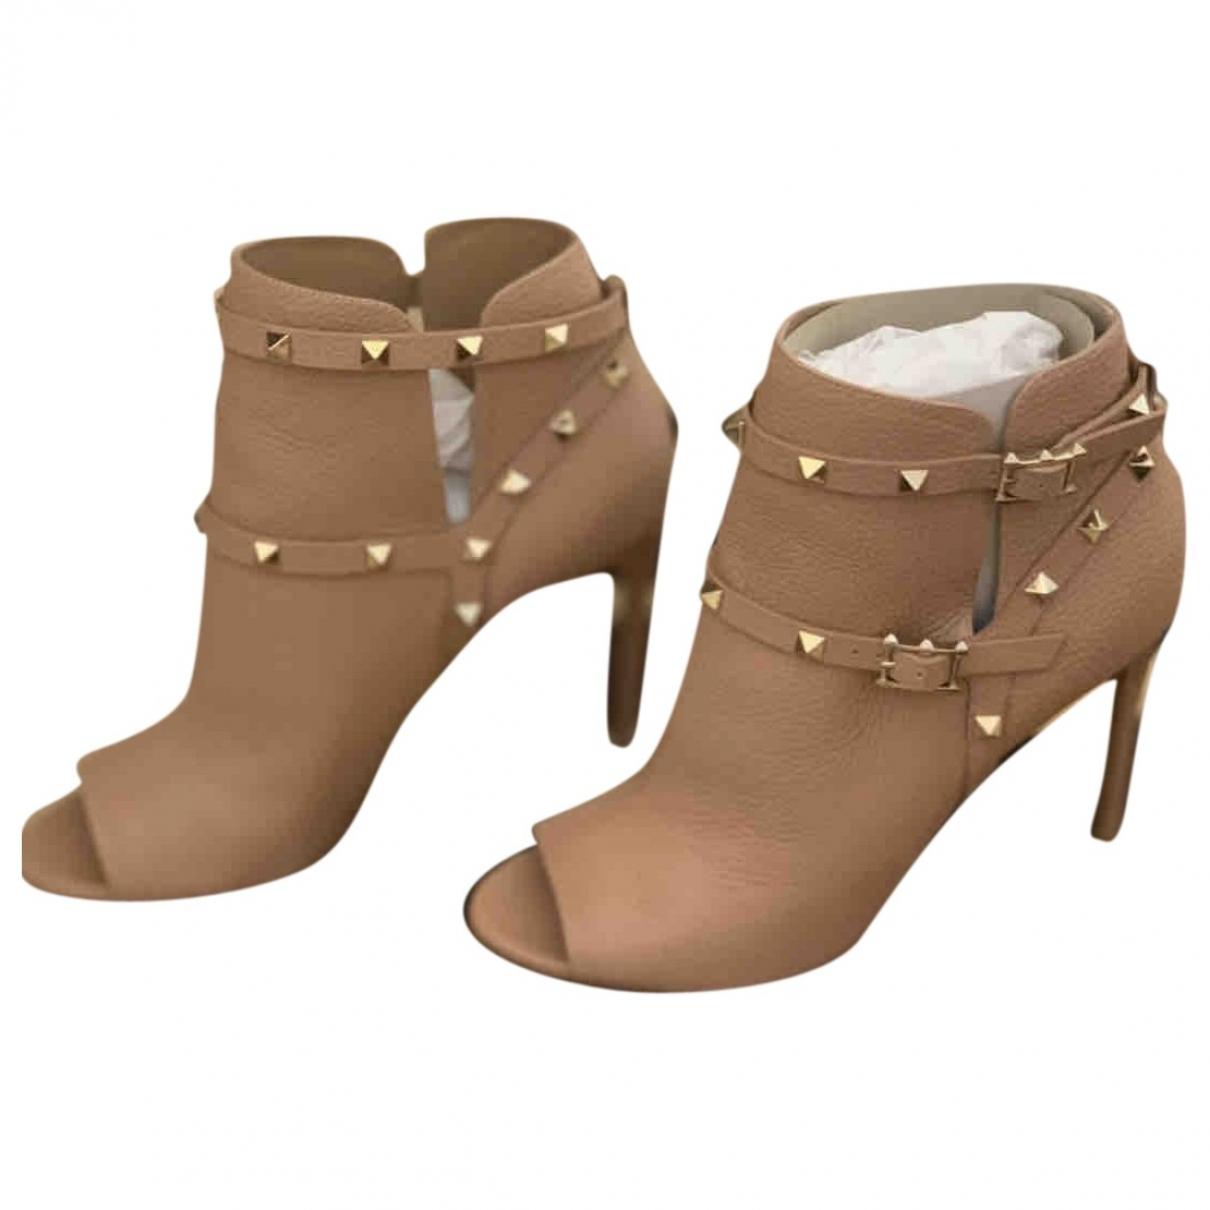 Valentino Garavani Rockstud Beige Leather Ankle boots for Women 40 EU